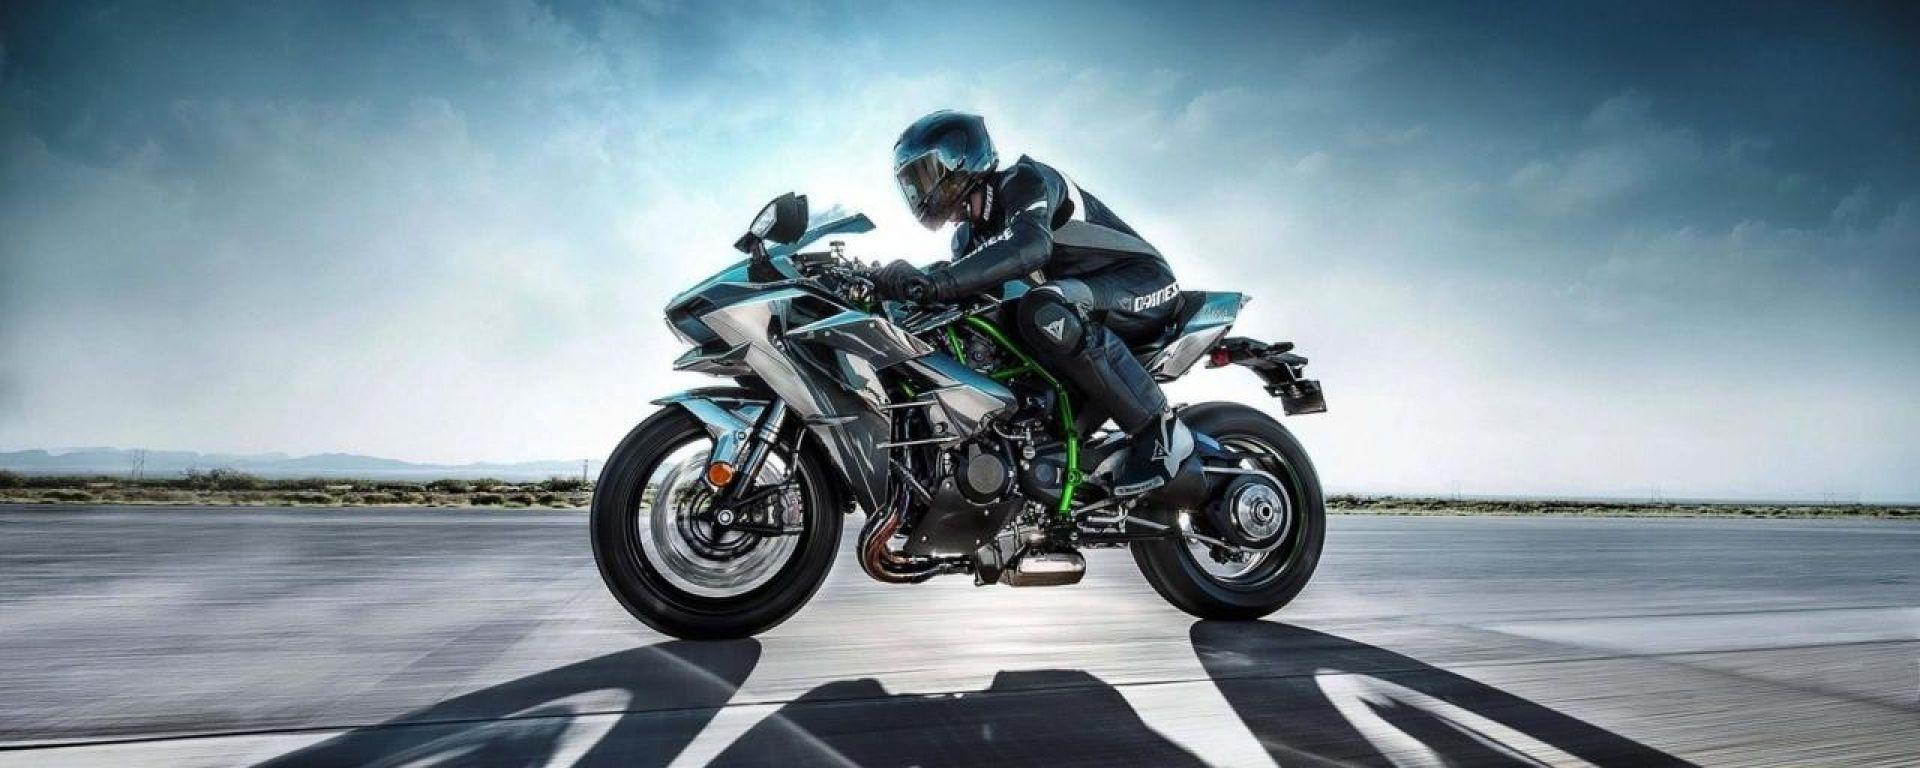 La Kawasaki H2R sfida una Formula 1, un F16 e diverse supercar